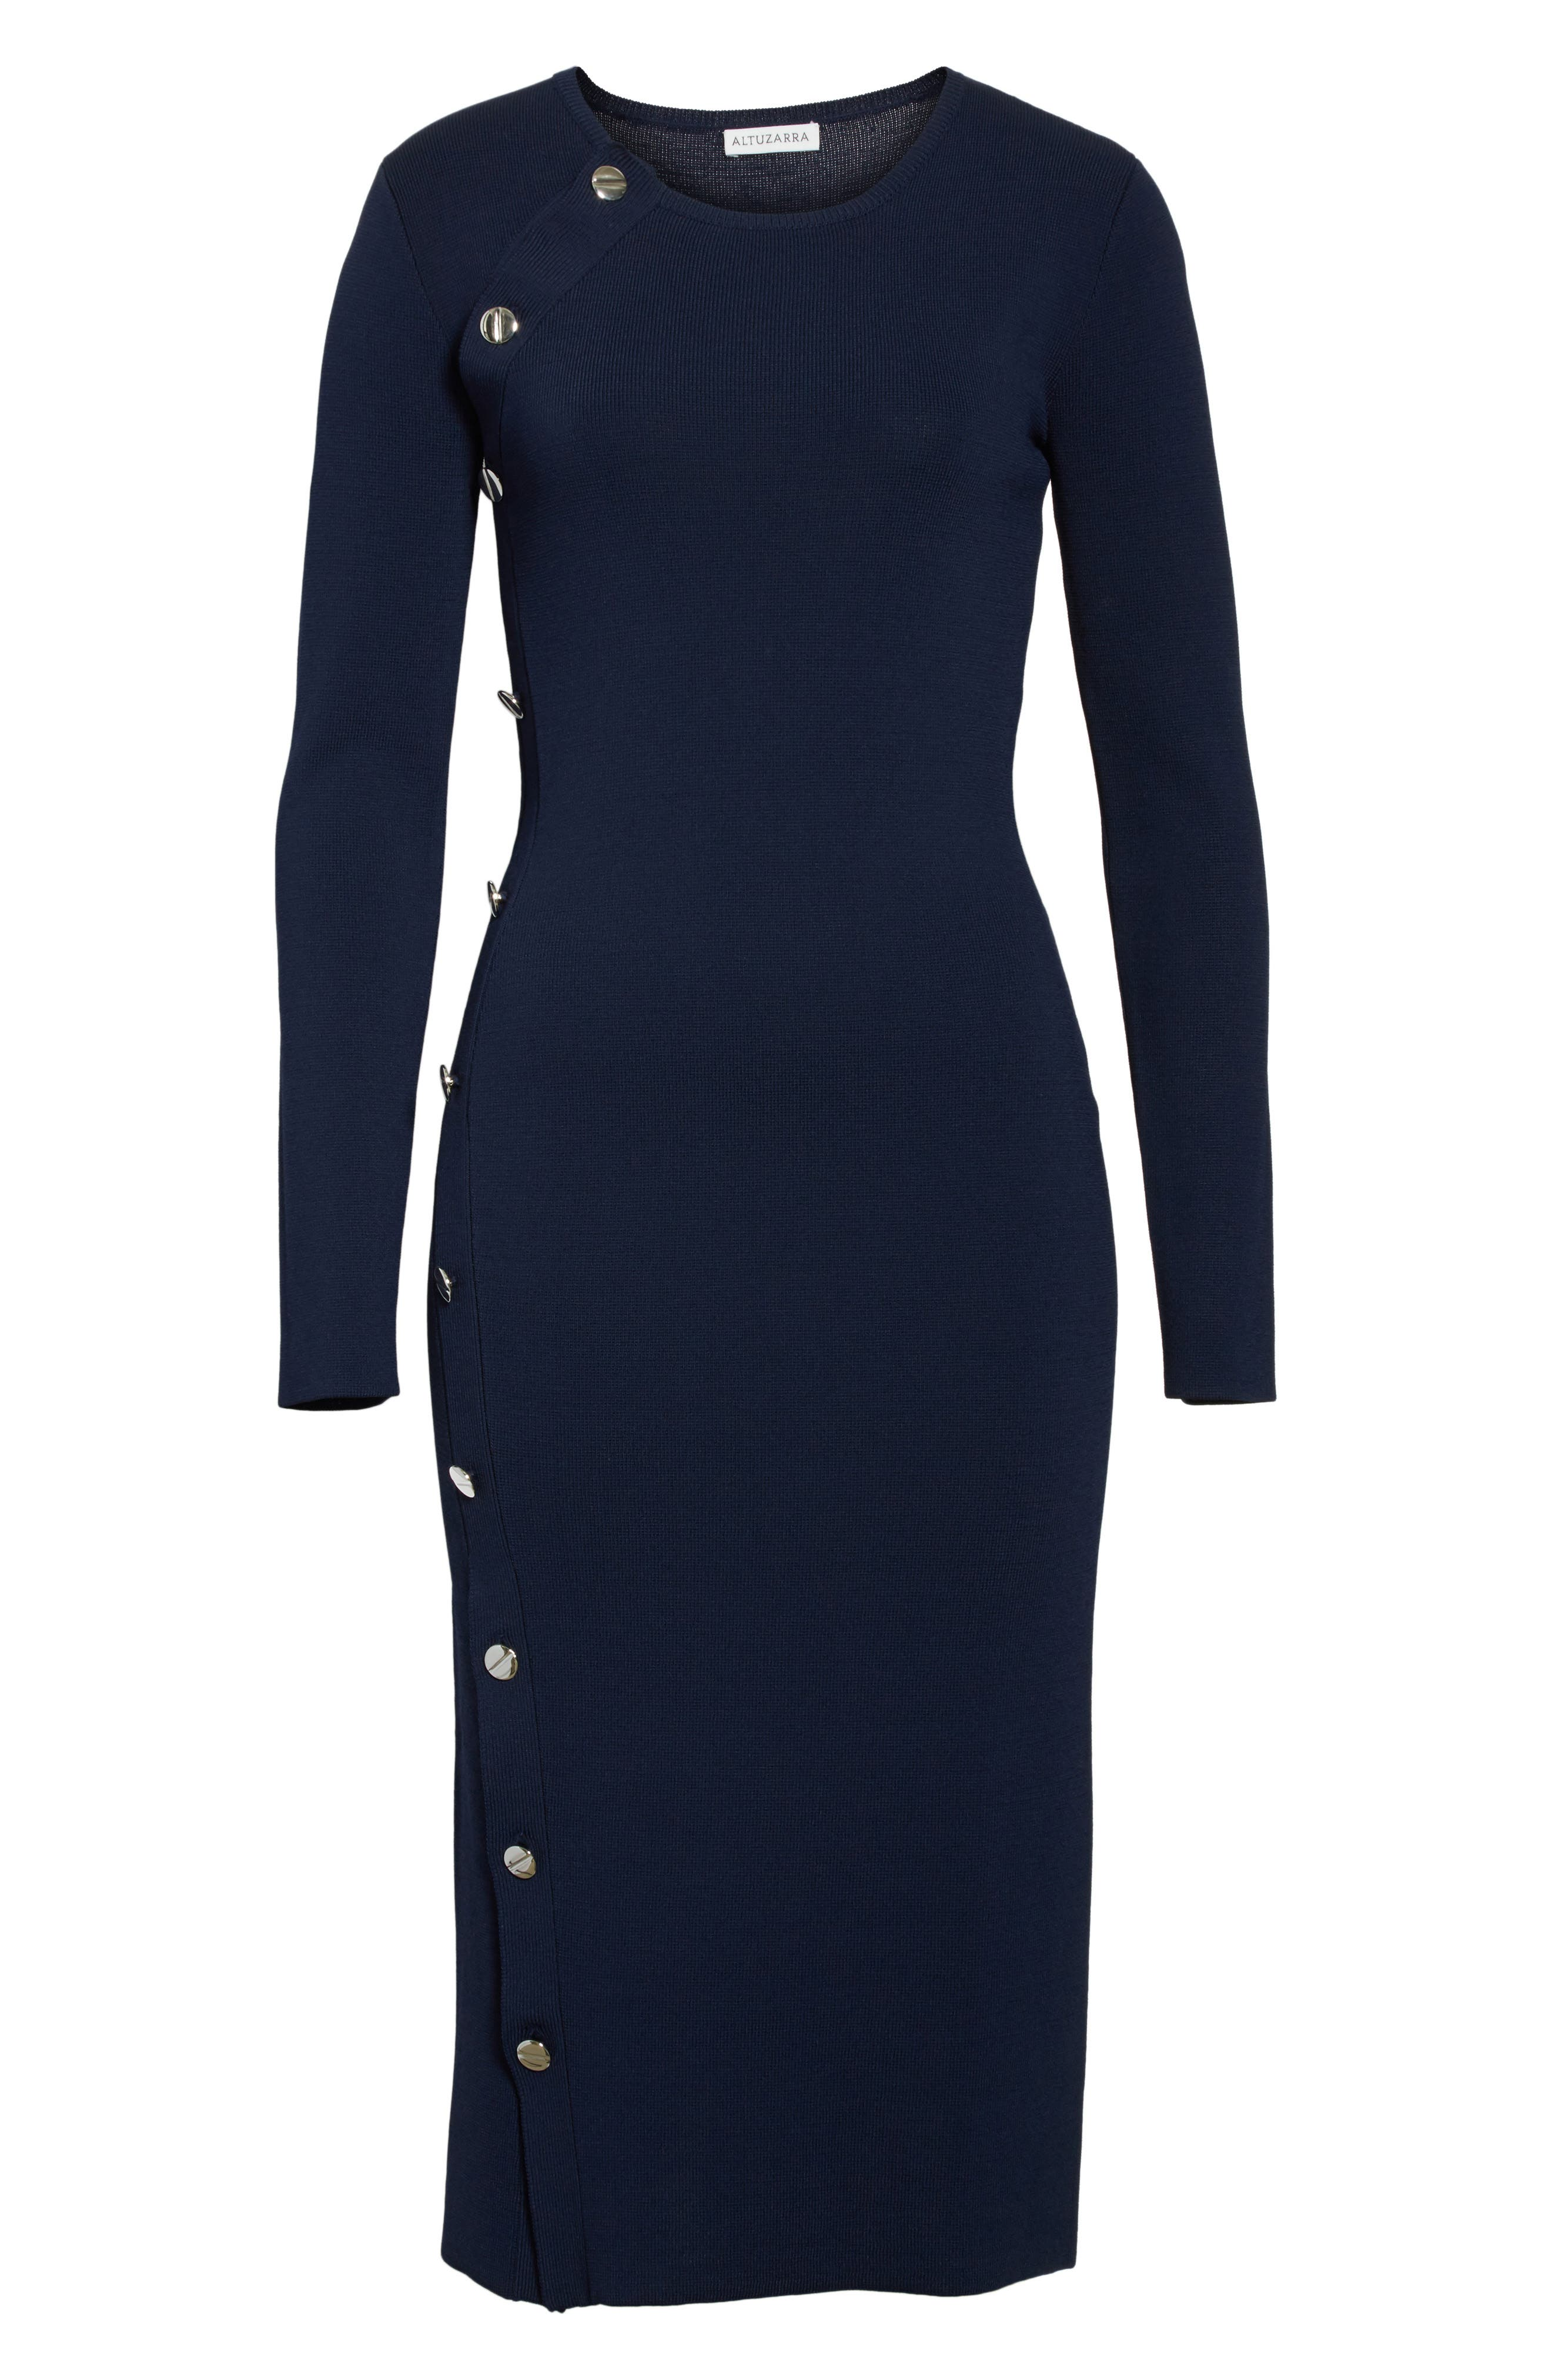 Button Detail Knit Dress,                             Alternate thumbnail 7, color,                             Navy